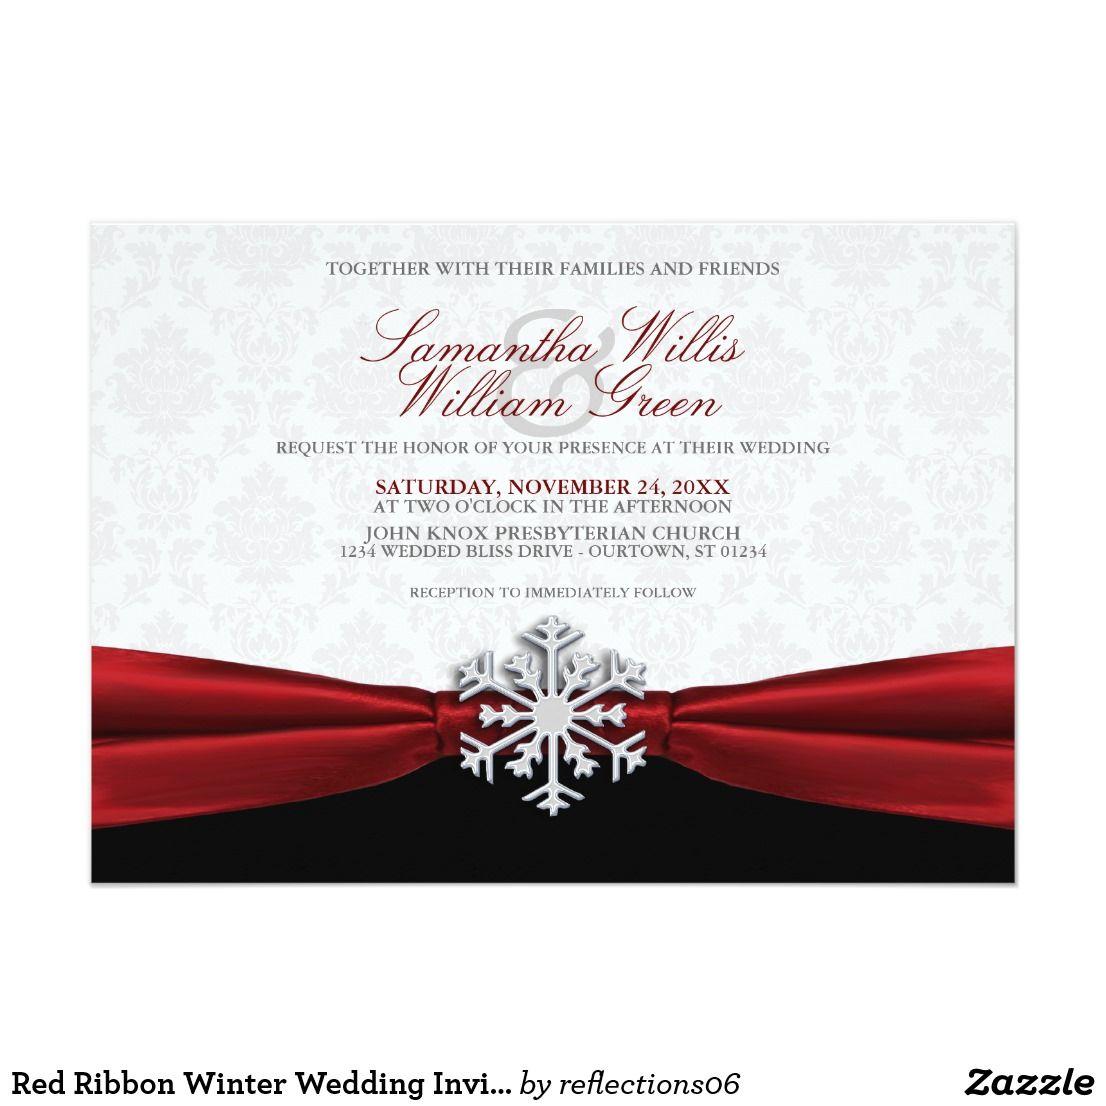 Red Ribbon Winter Wedding Invitation | Winter wedding invitations ...